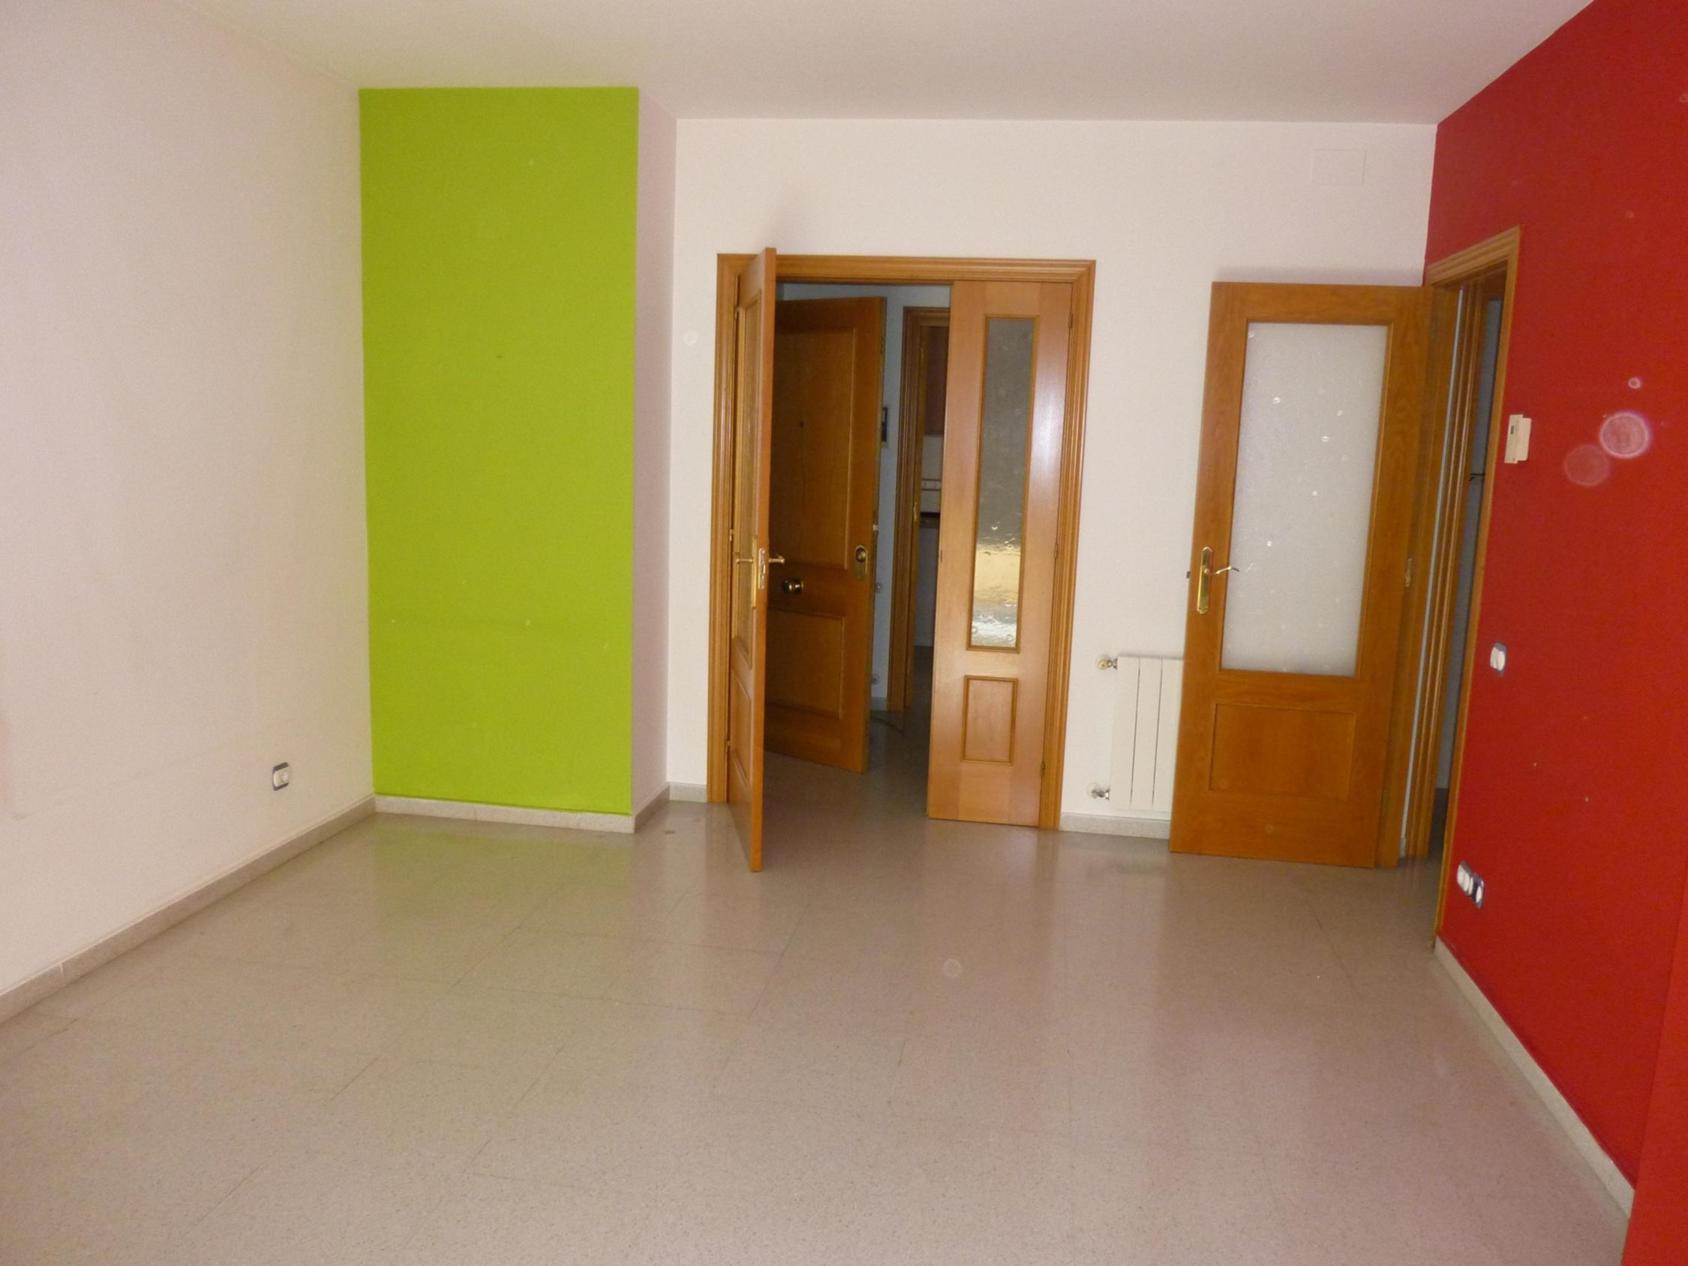 Apartamento en Santa Coloma de Gramenet (34837-0001) - foto1